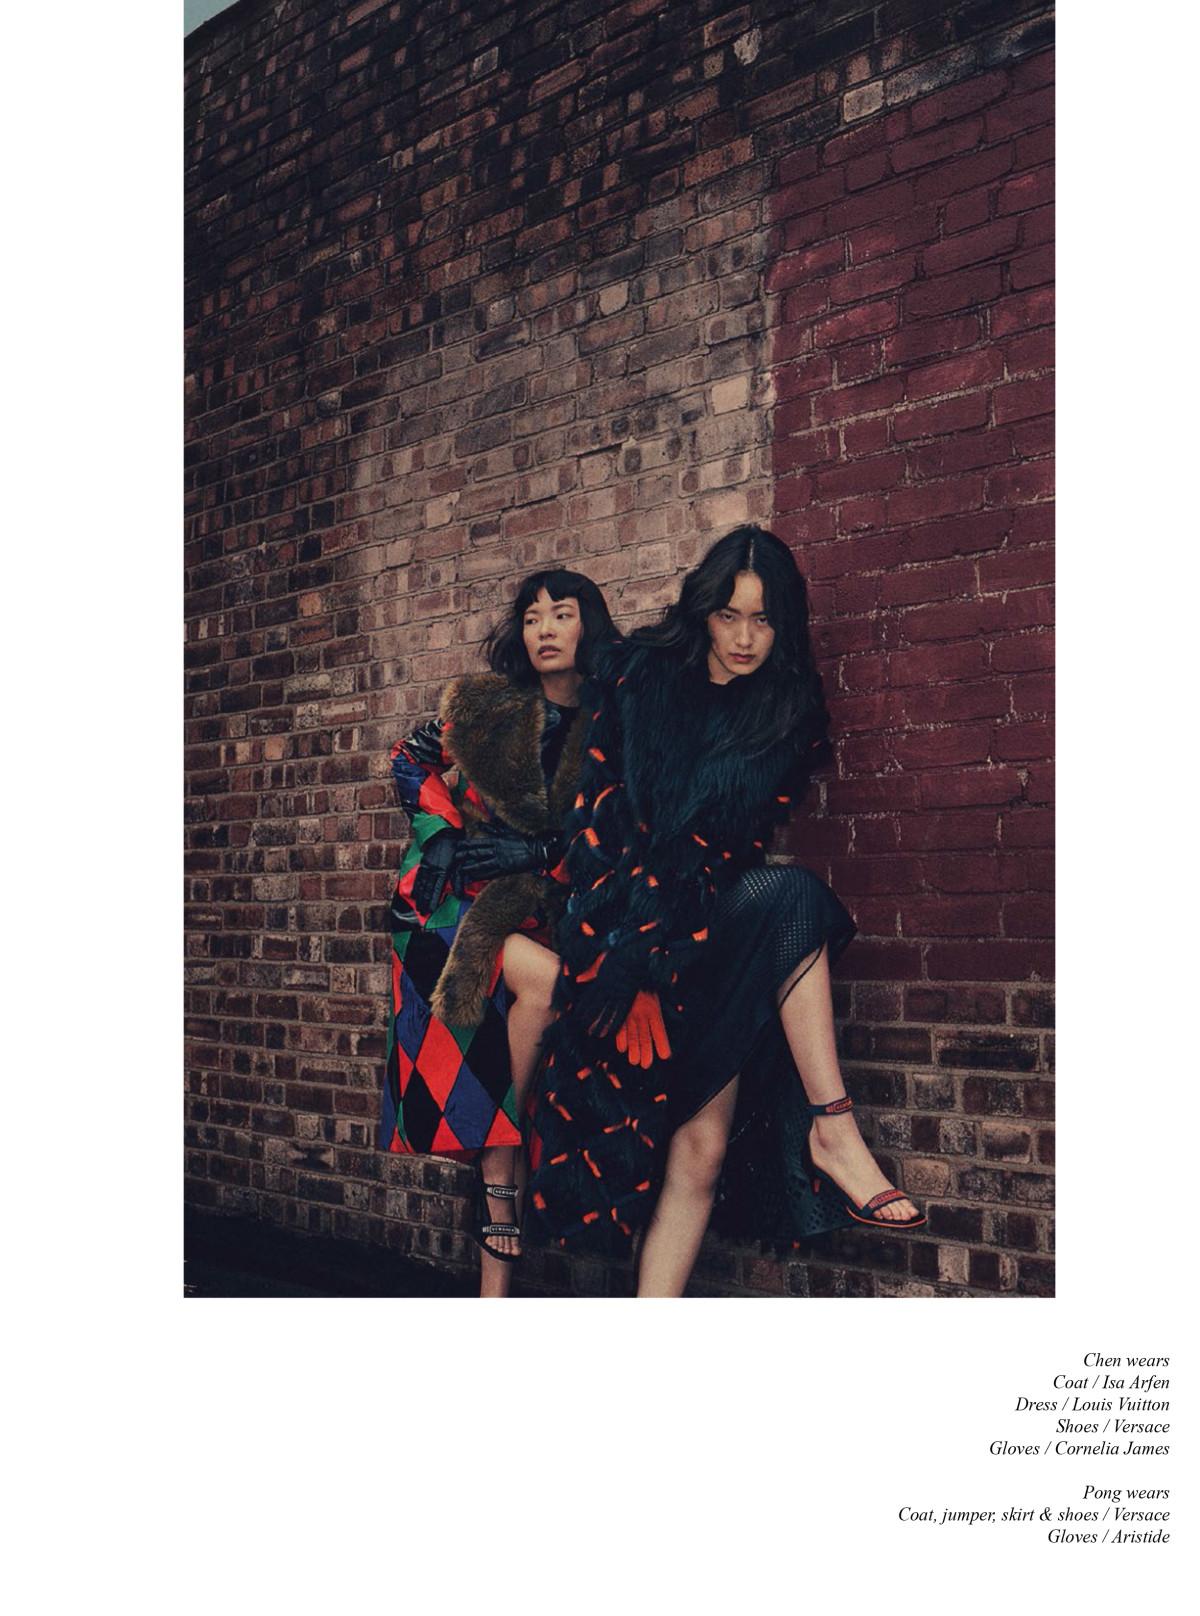 schon, Elizabeth Mews,Marie Schuller, Chen Xue, Pong Lee, Rainy london Shoot,Claudine Blythman Makeup, Sofia Sjoo, Kristofi Von Strass, Chinese Models, Brown Cheeks, Earthy Makeup, London,Schon Magazine,